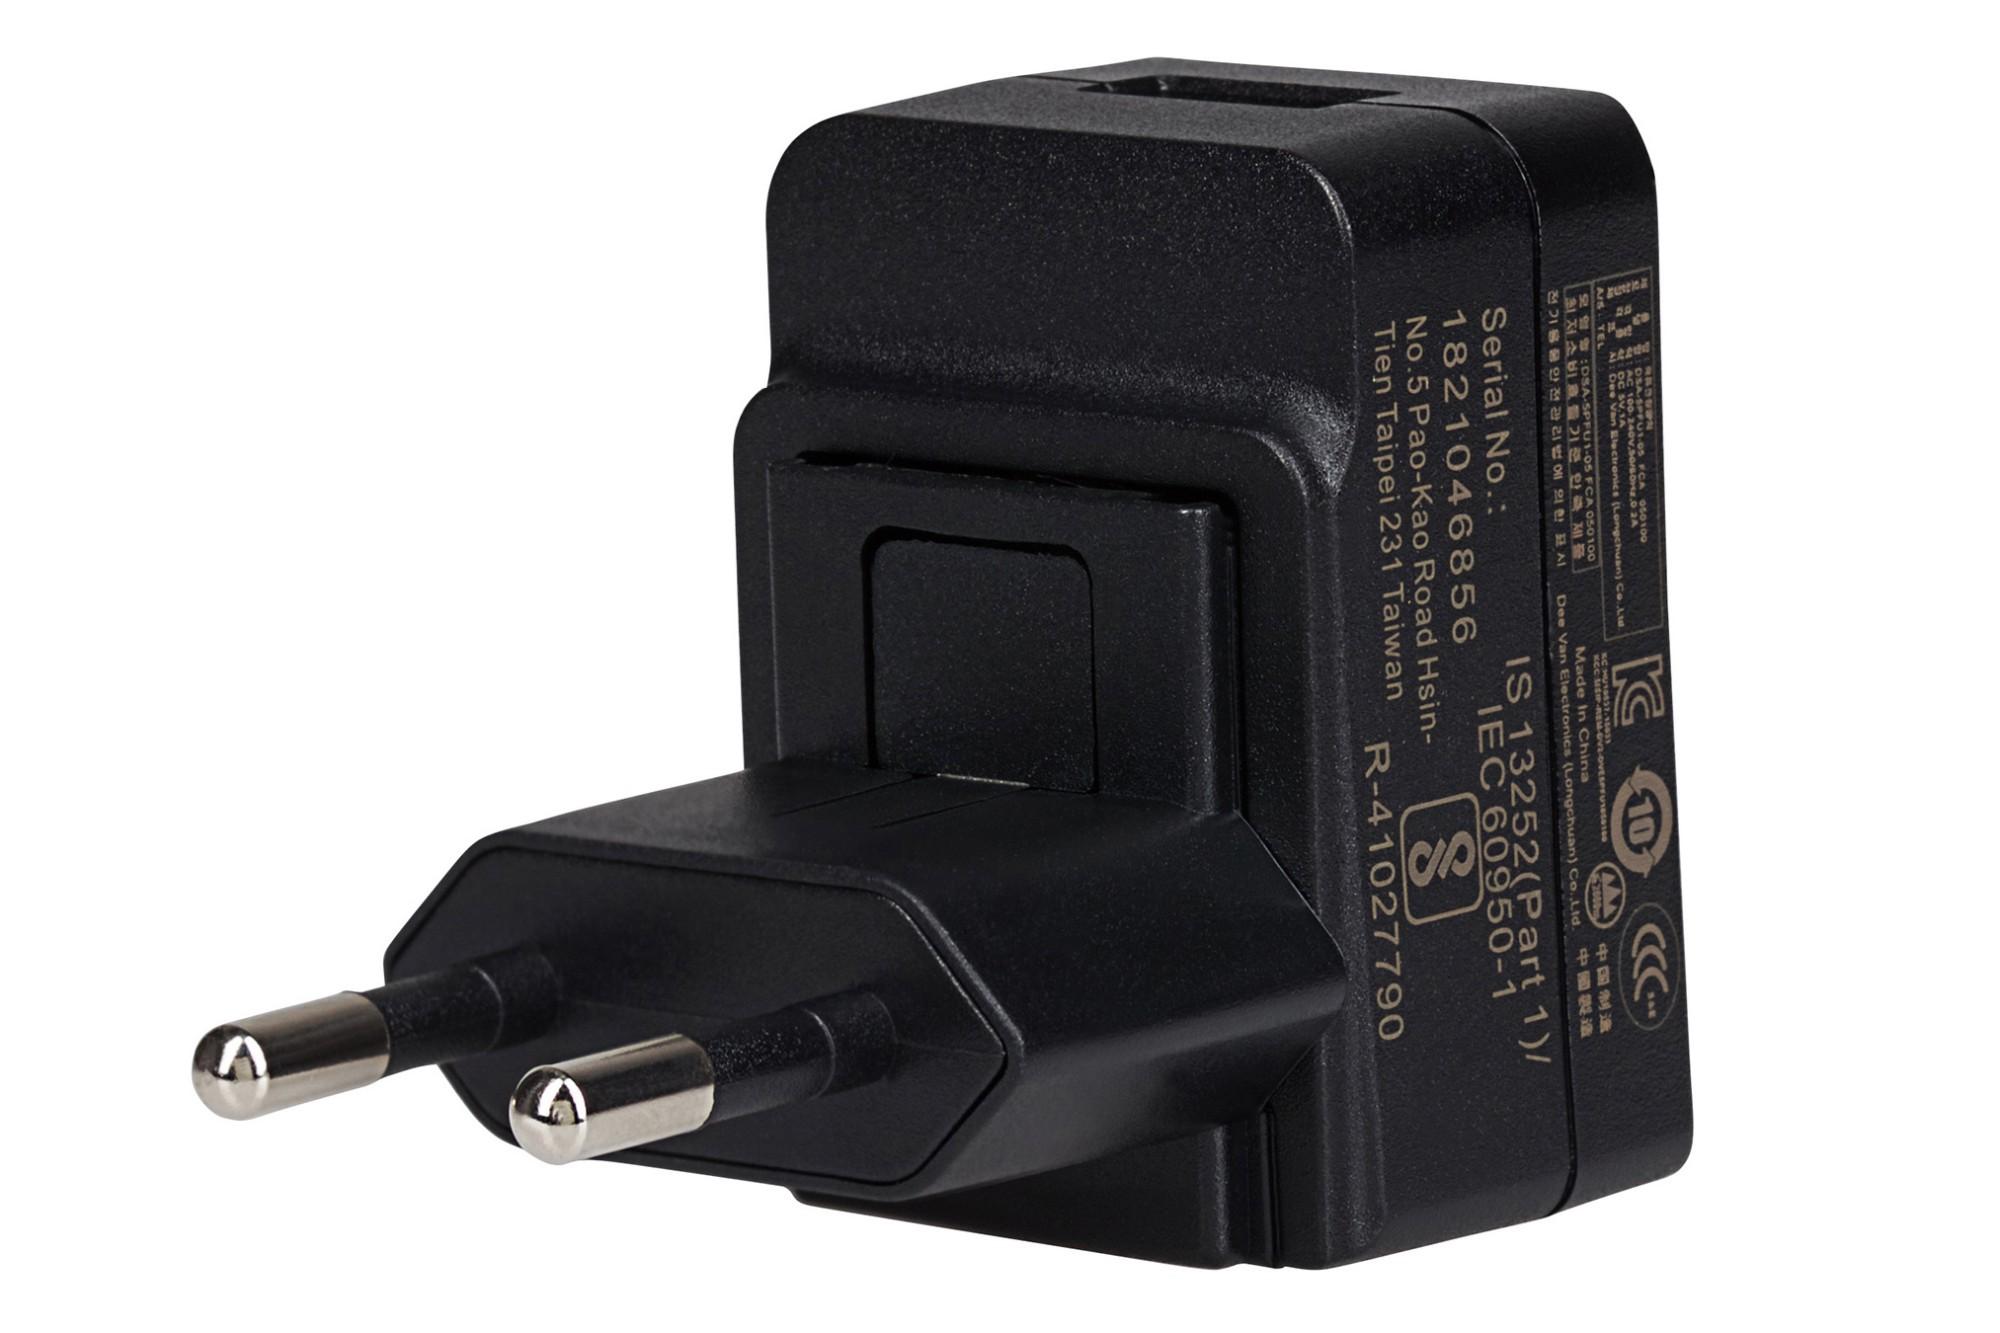 MAPLIN USB-A EU Wall Charger - Black